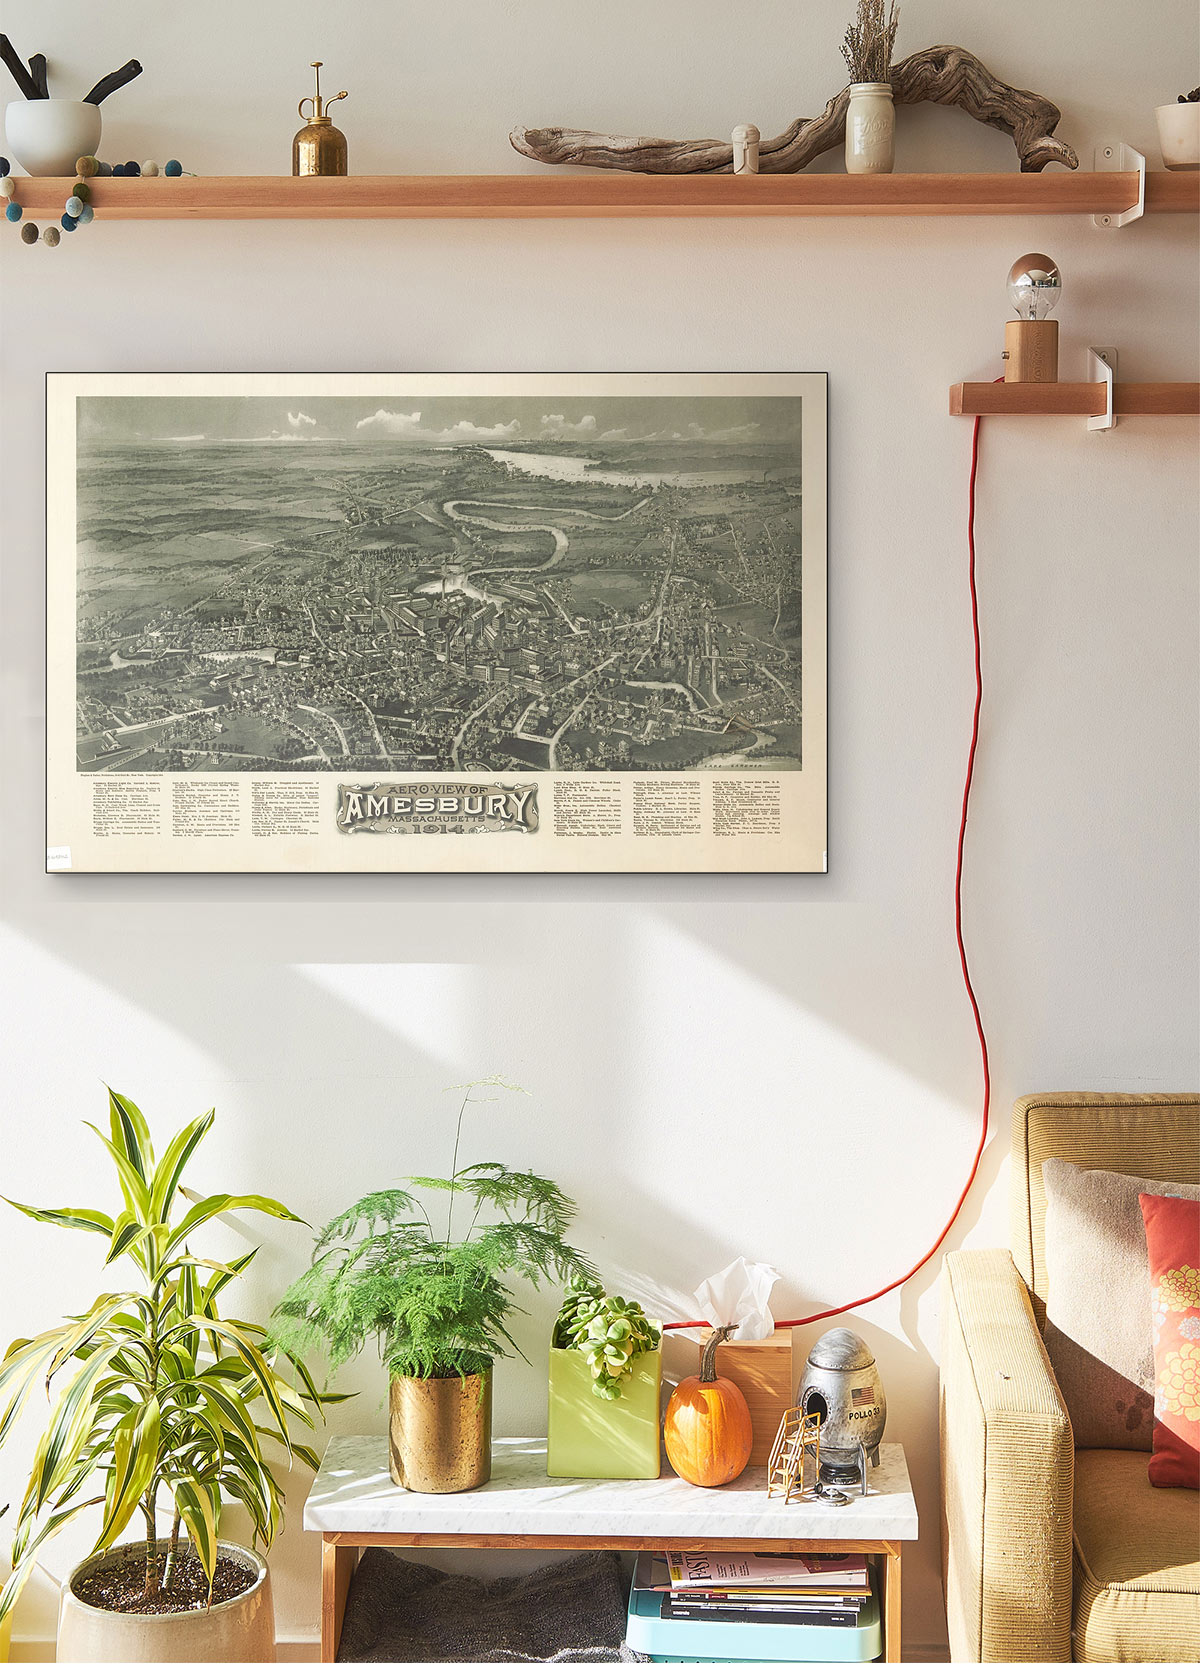 Aero View Of Amesbury Massachusetts 1914 LARGE Vintage Map